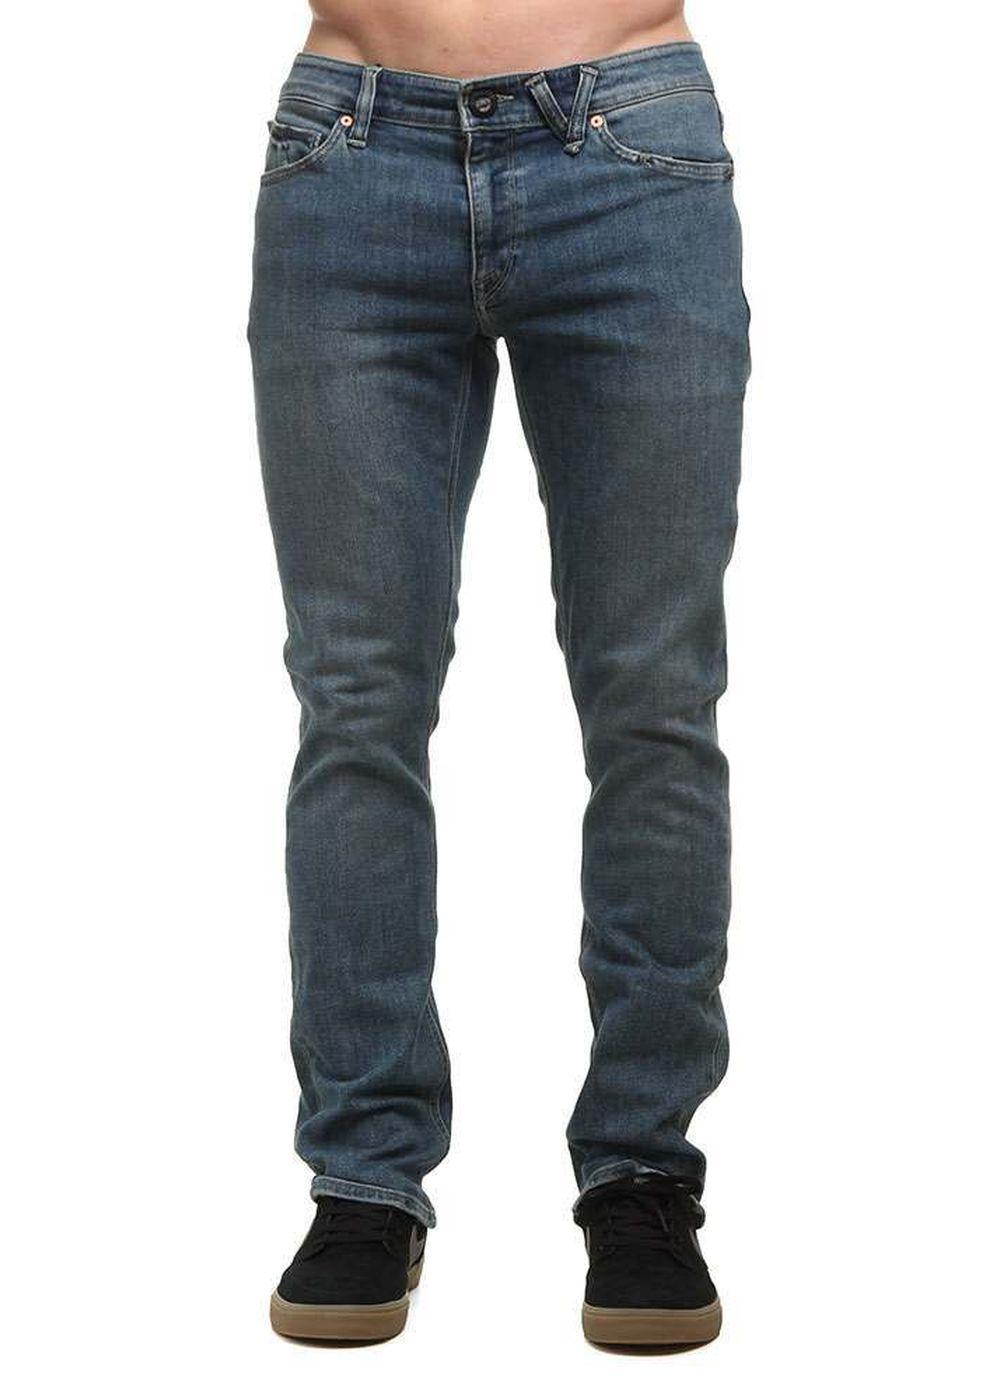 volcom-vorta-jeans-seventies-indigo